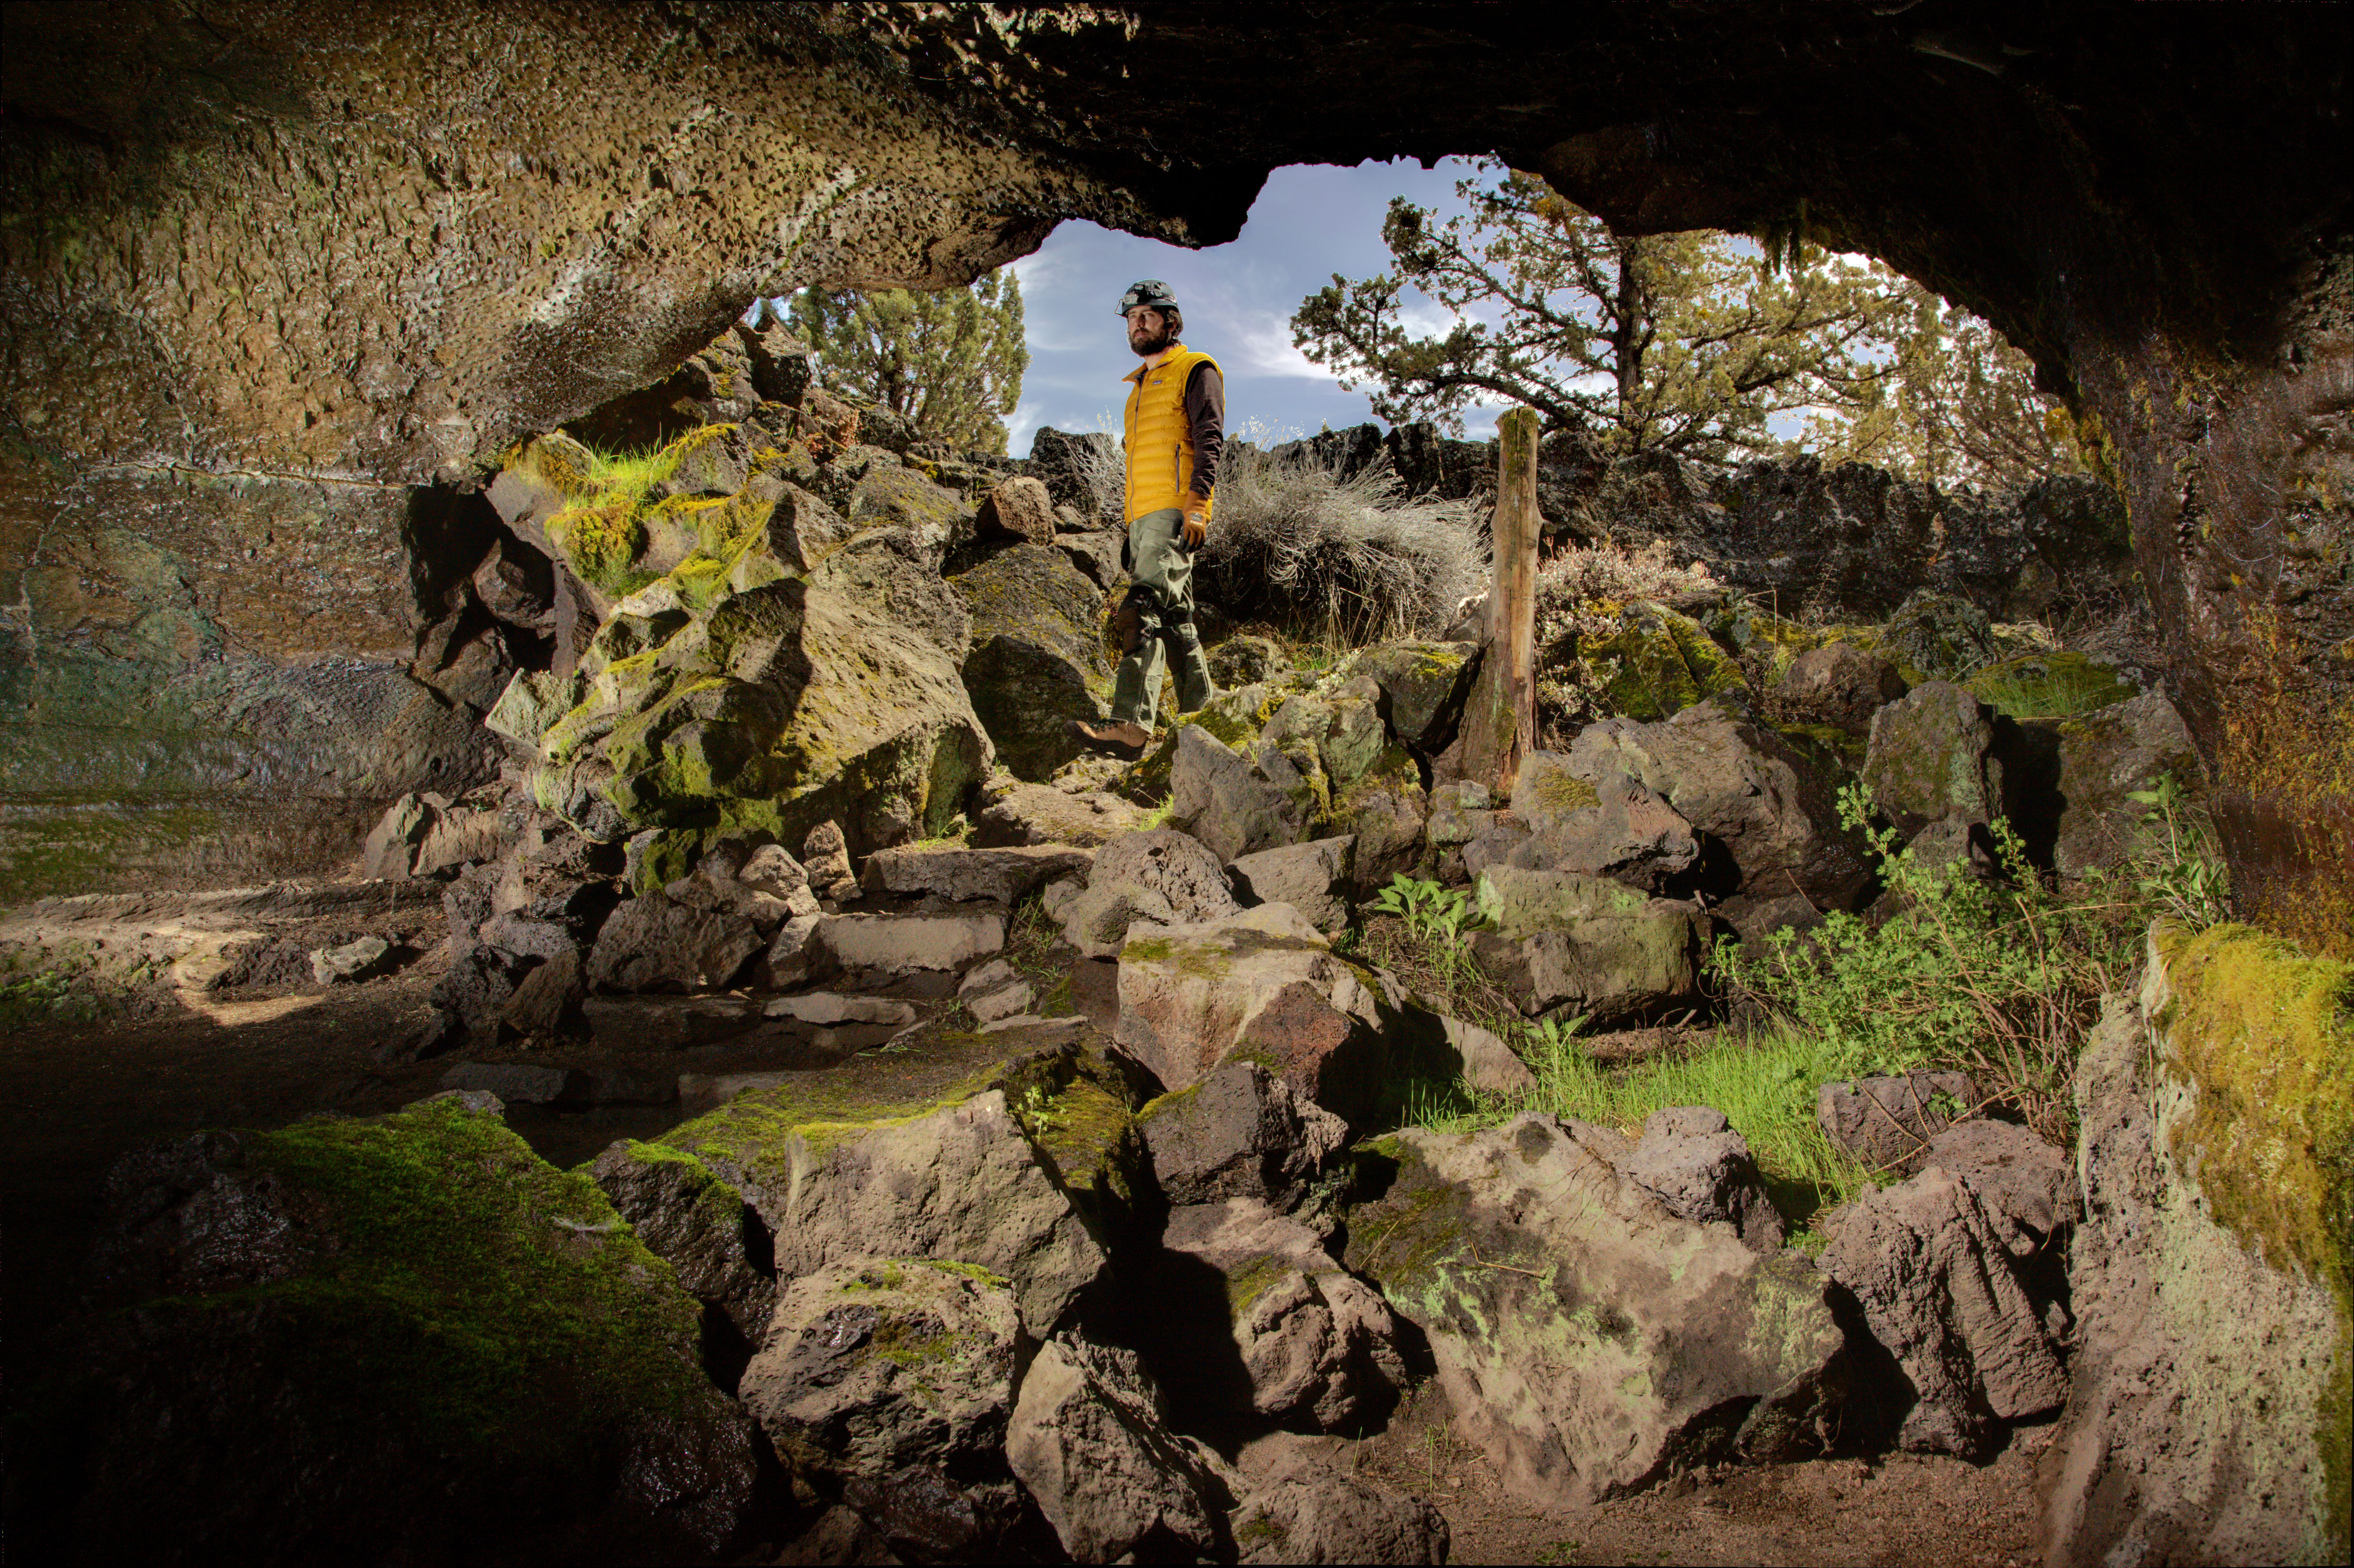 Caving Lava Beds National Monument U S National Park